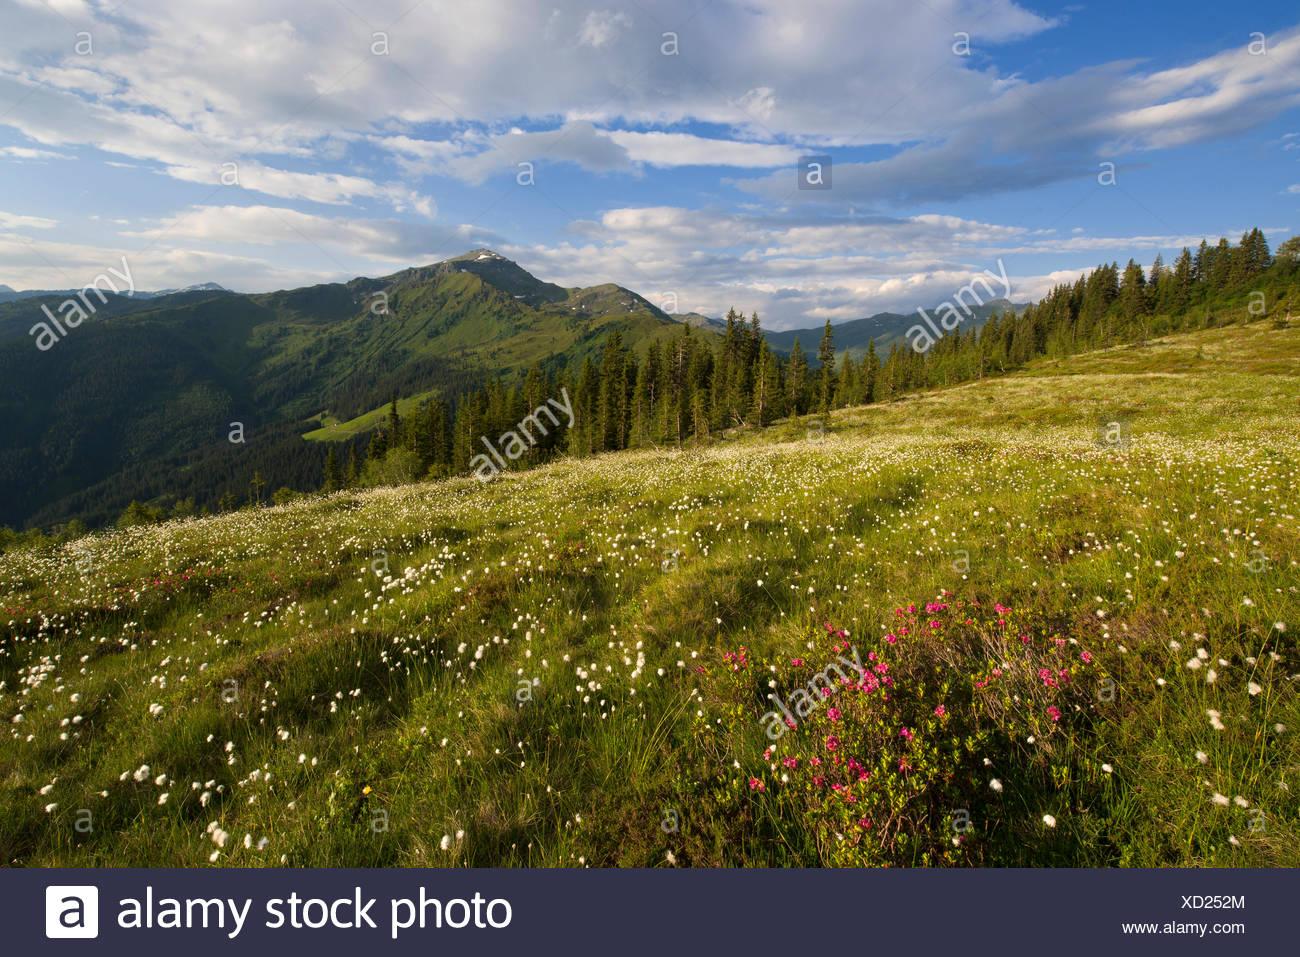 Naunz in spring, Naunz, Kellerjoch, Tux Prealps, Tyrol, Austria, Europe - Stock Image